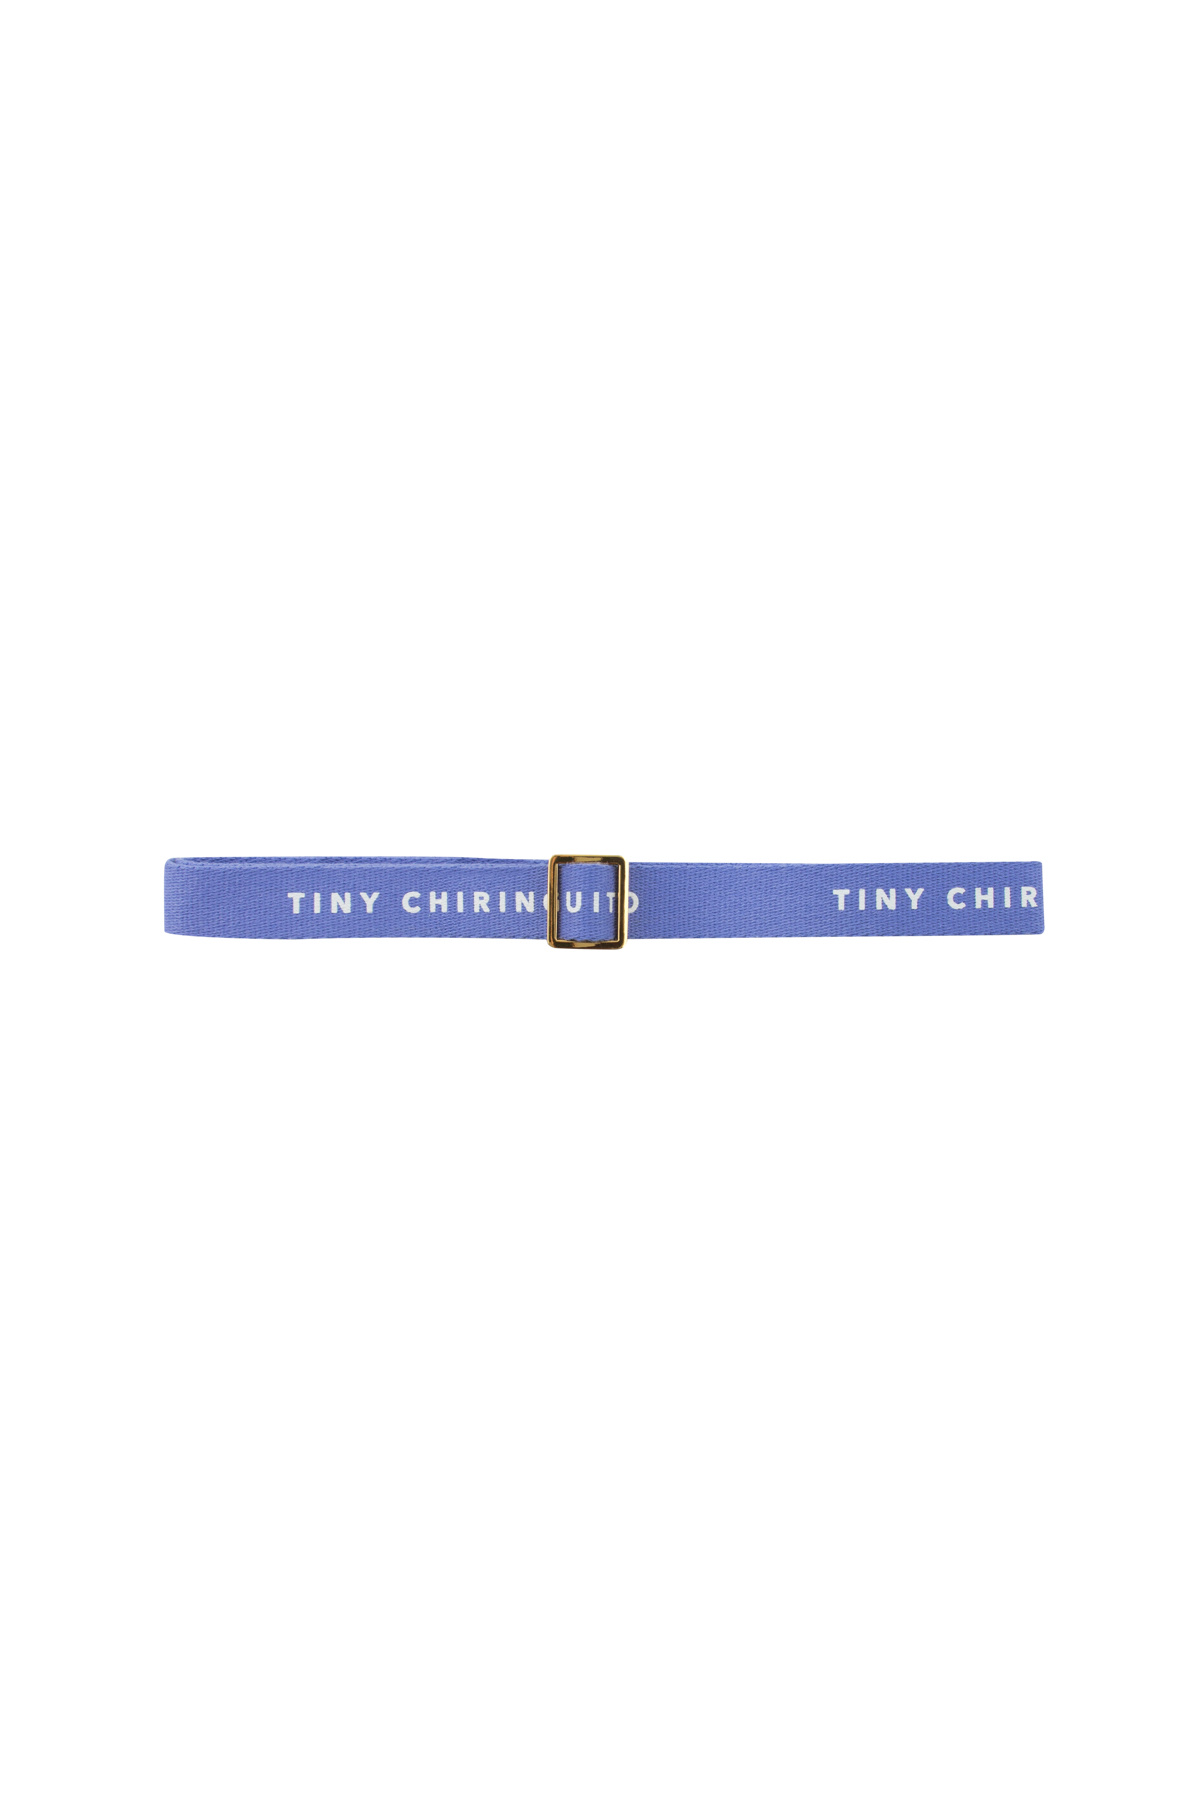 Tiny Chiringuito belt - Iris Blue / Off White-2